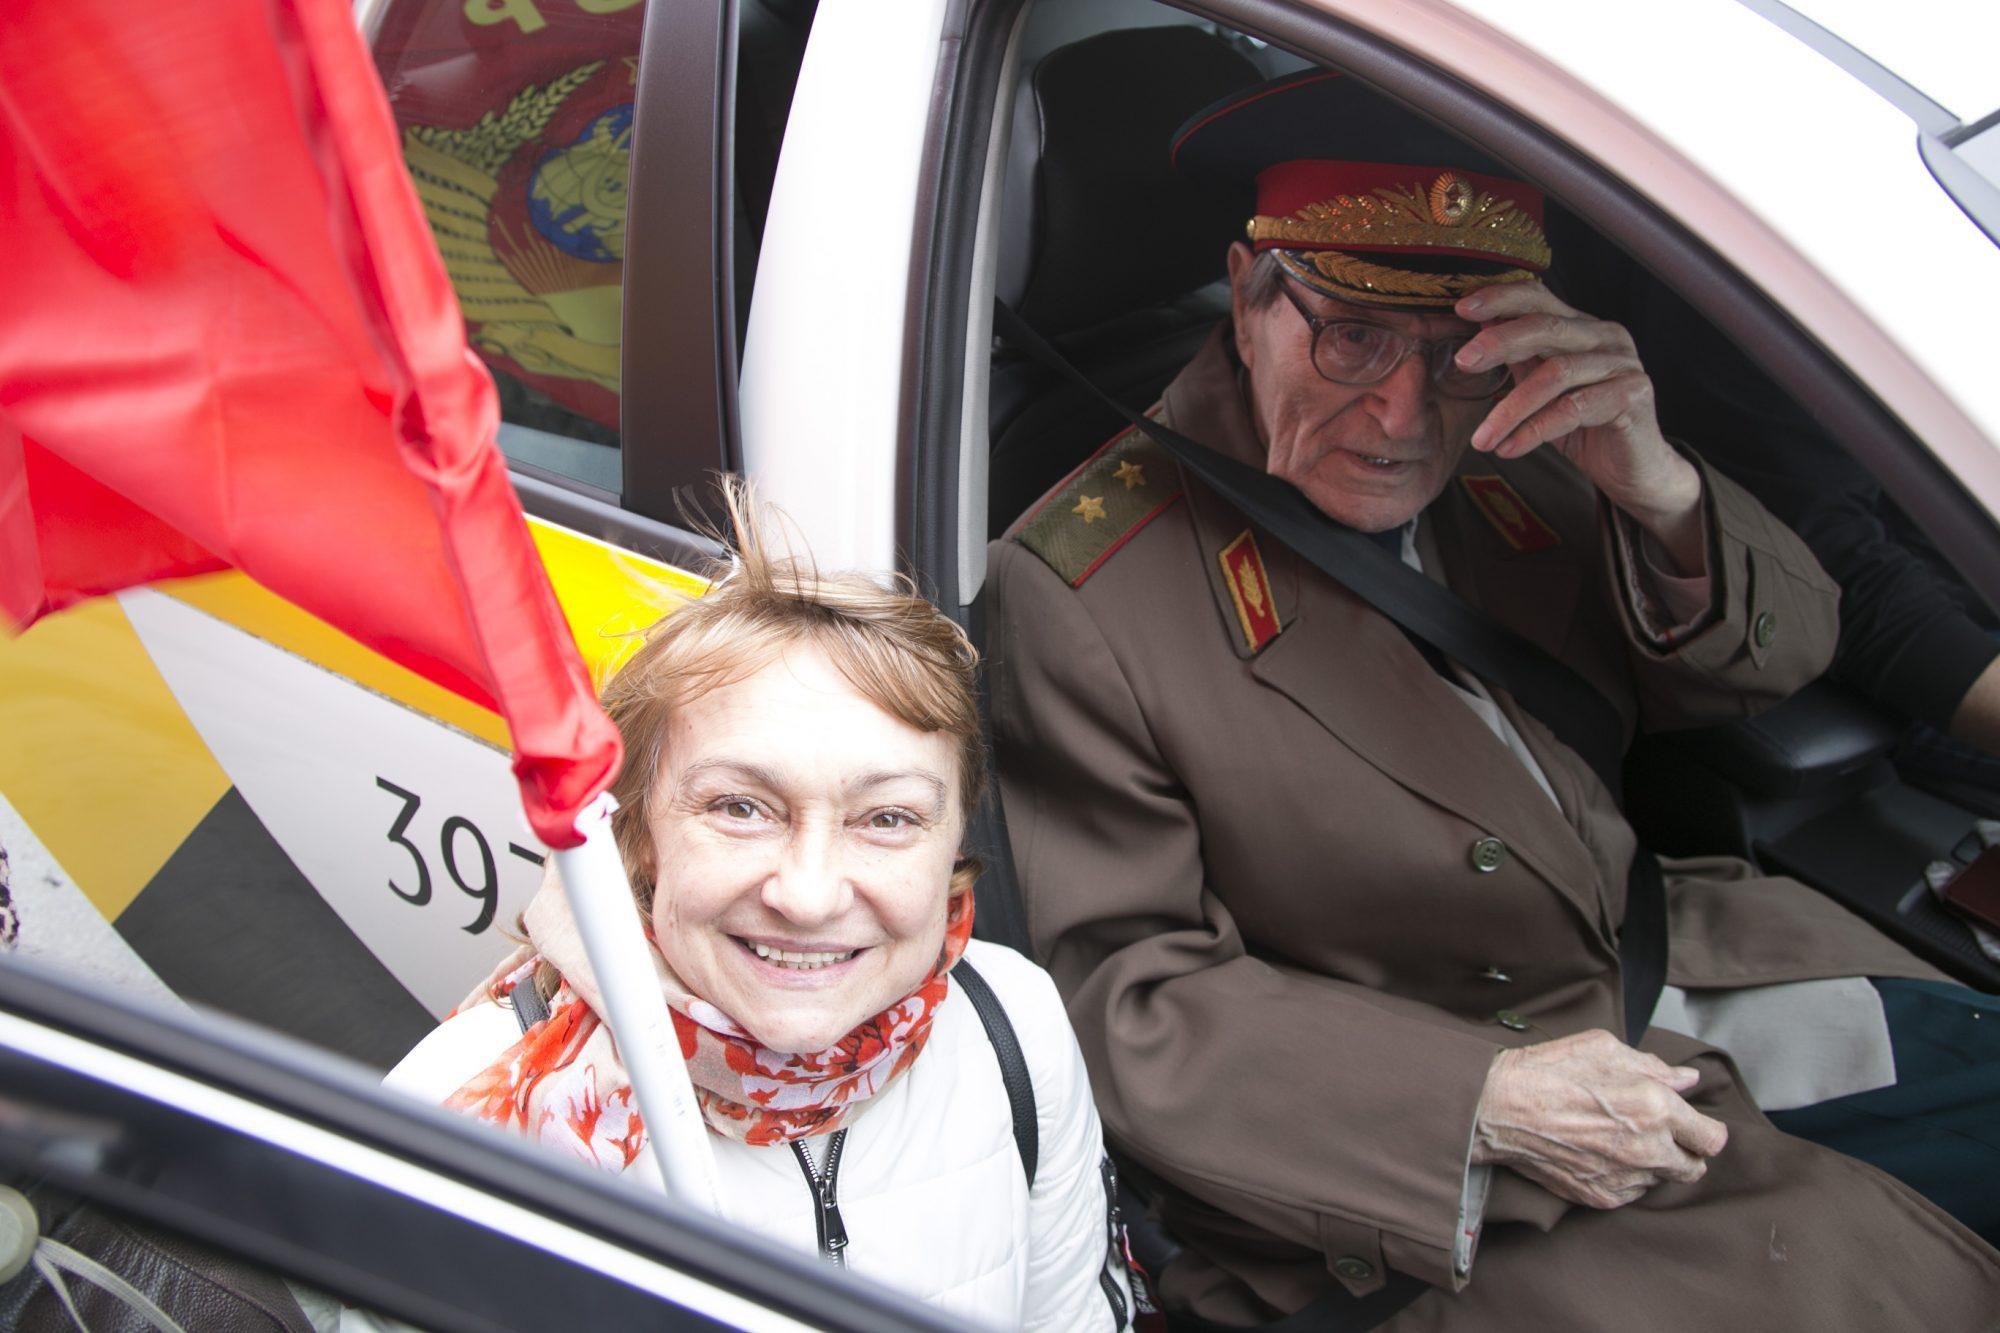 генерал-лейтенант, Спецстроя, Фомин, Алексей Григорьевич